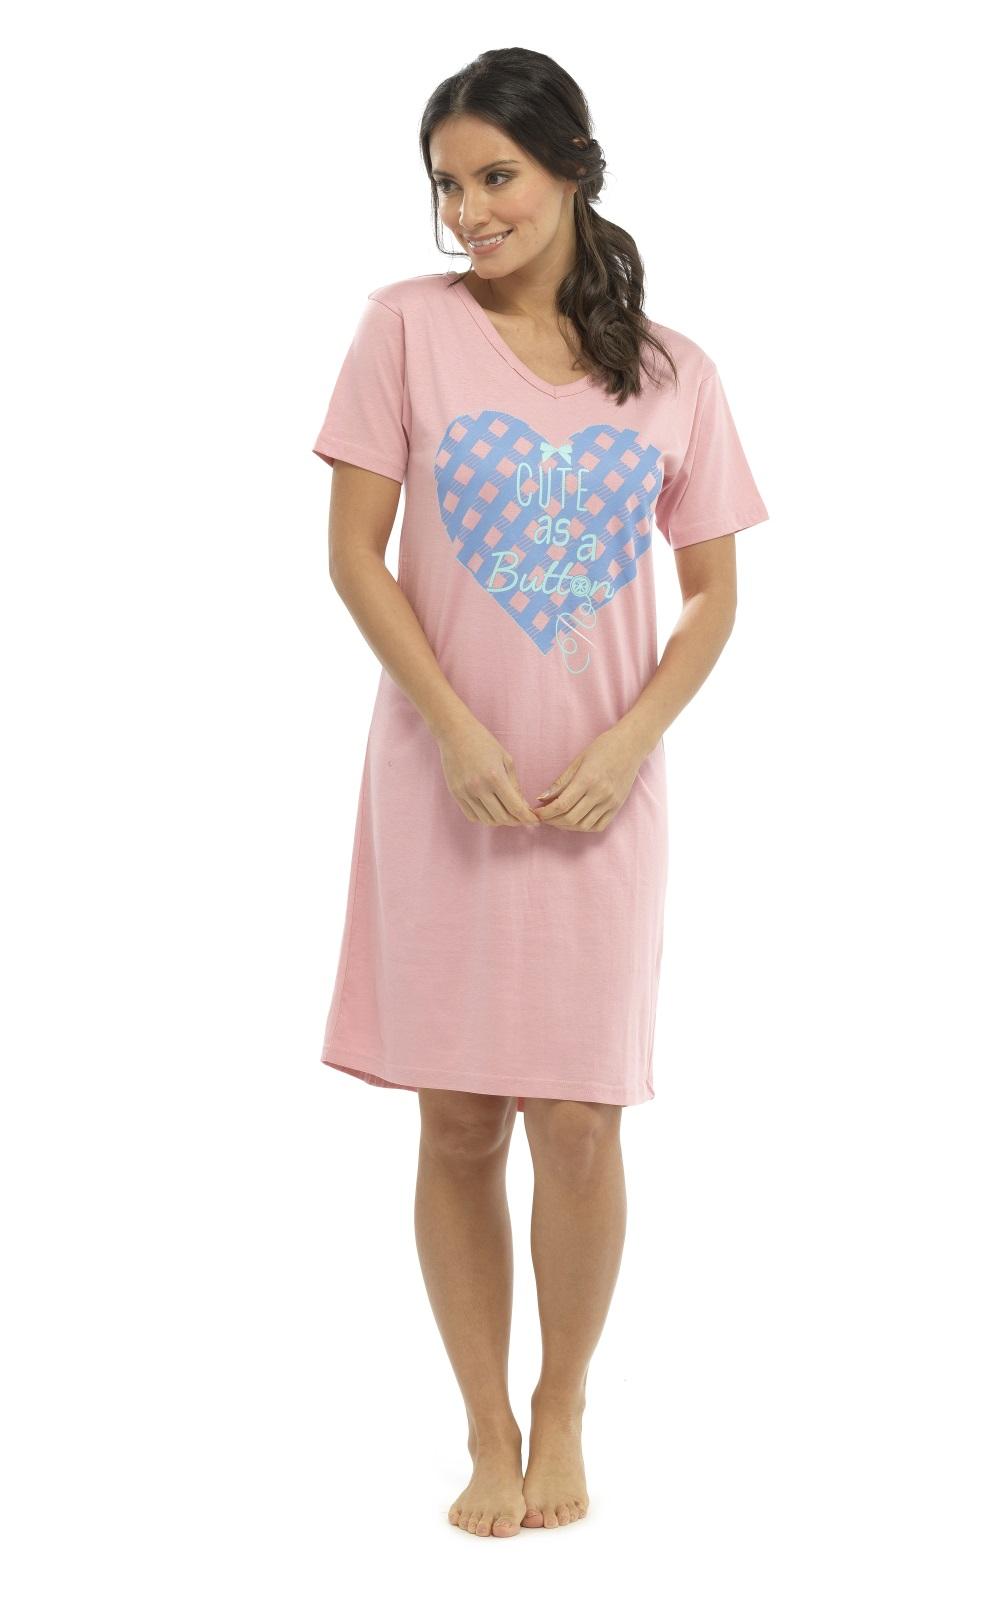 ... / Short Sleeve Nightdress T Shirt Slogan Nighty Pyjamas Nightie Size